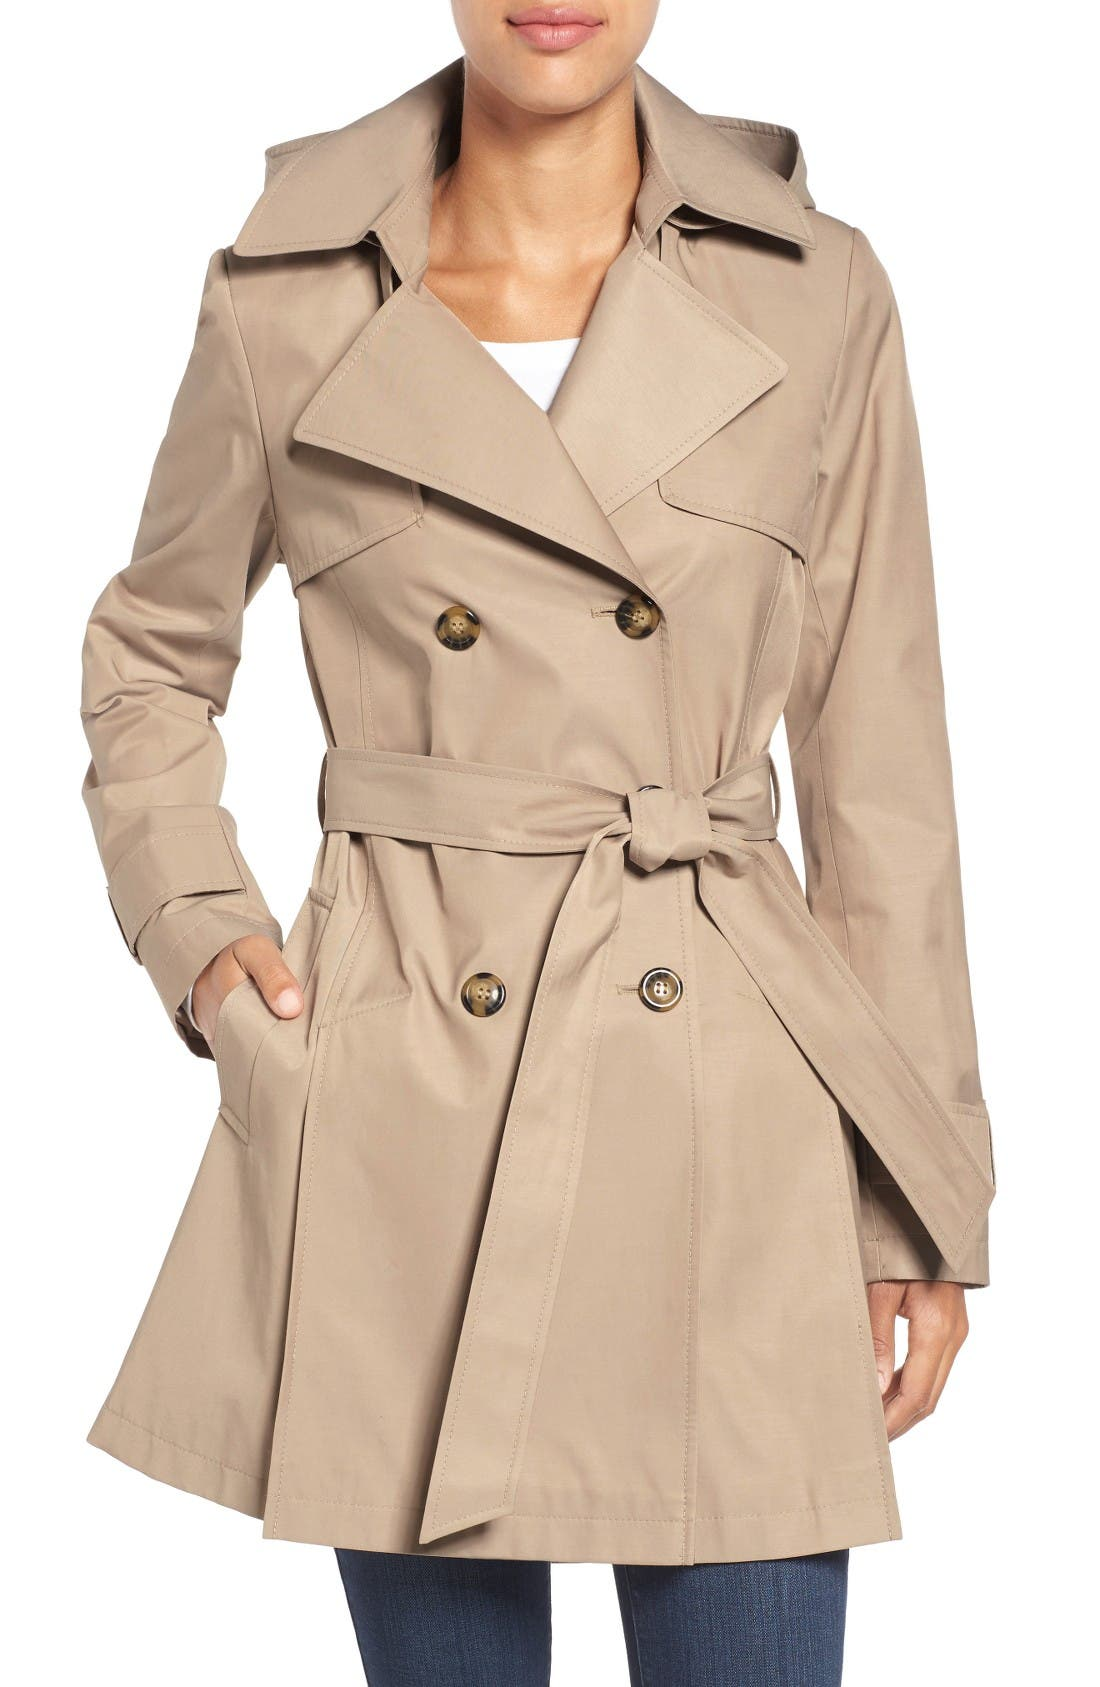 Alternate Image 1 Selected - Halogen® Detachable Hood Trench Coat (Regular & Petite)